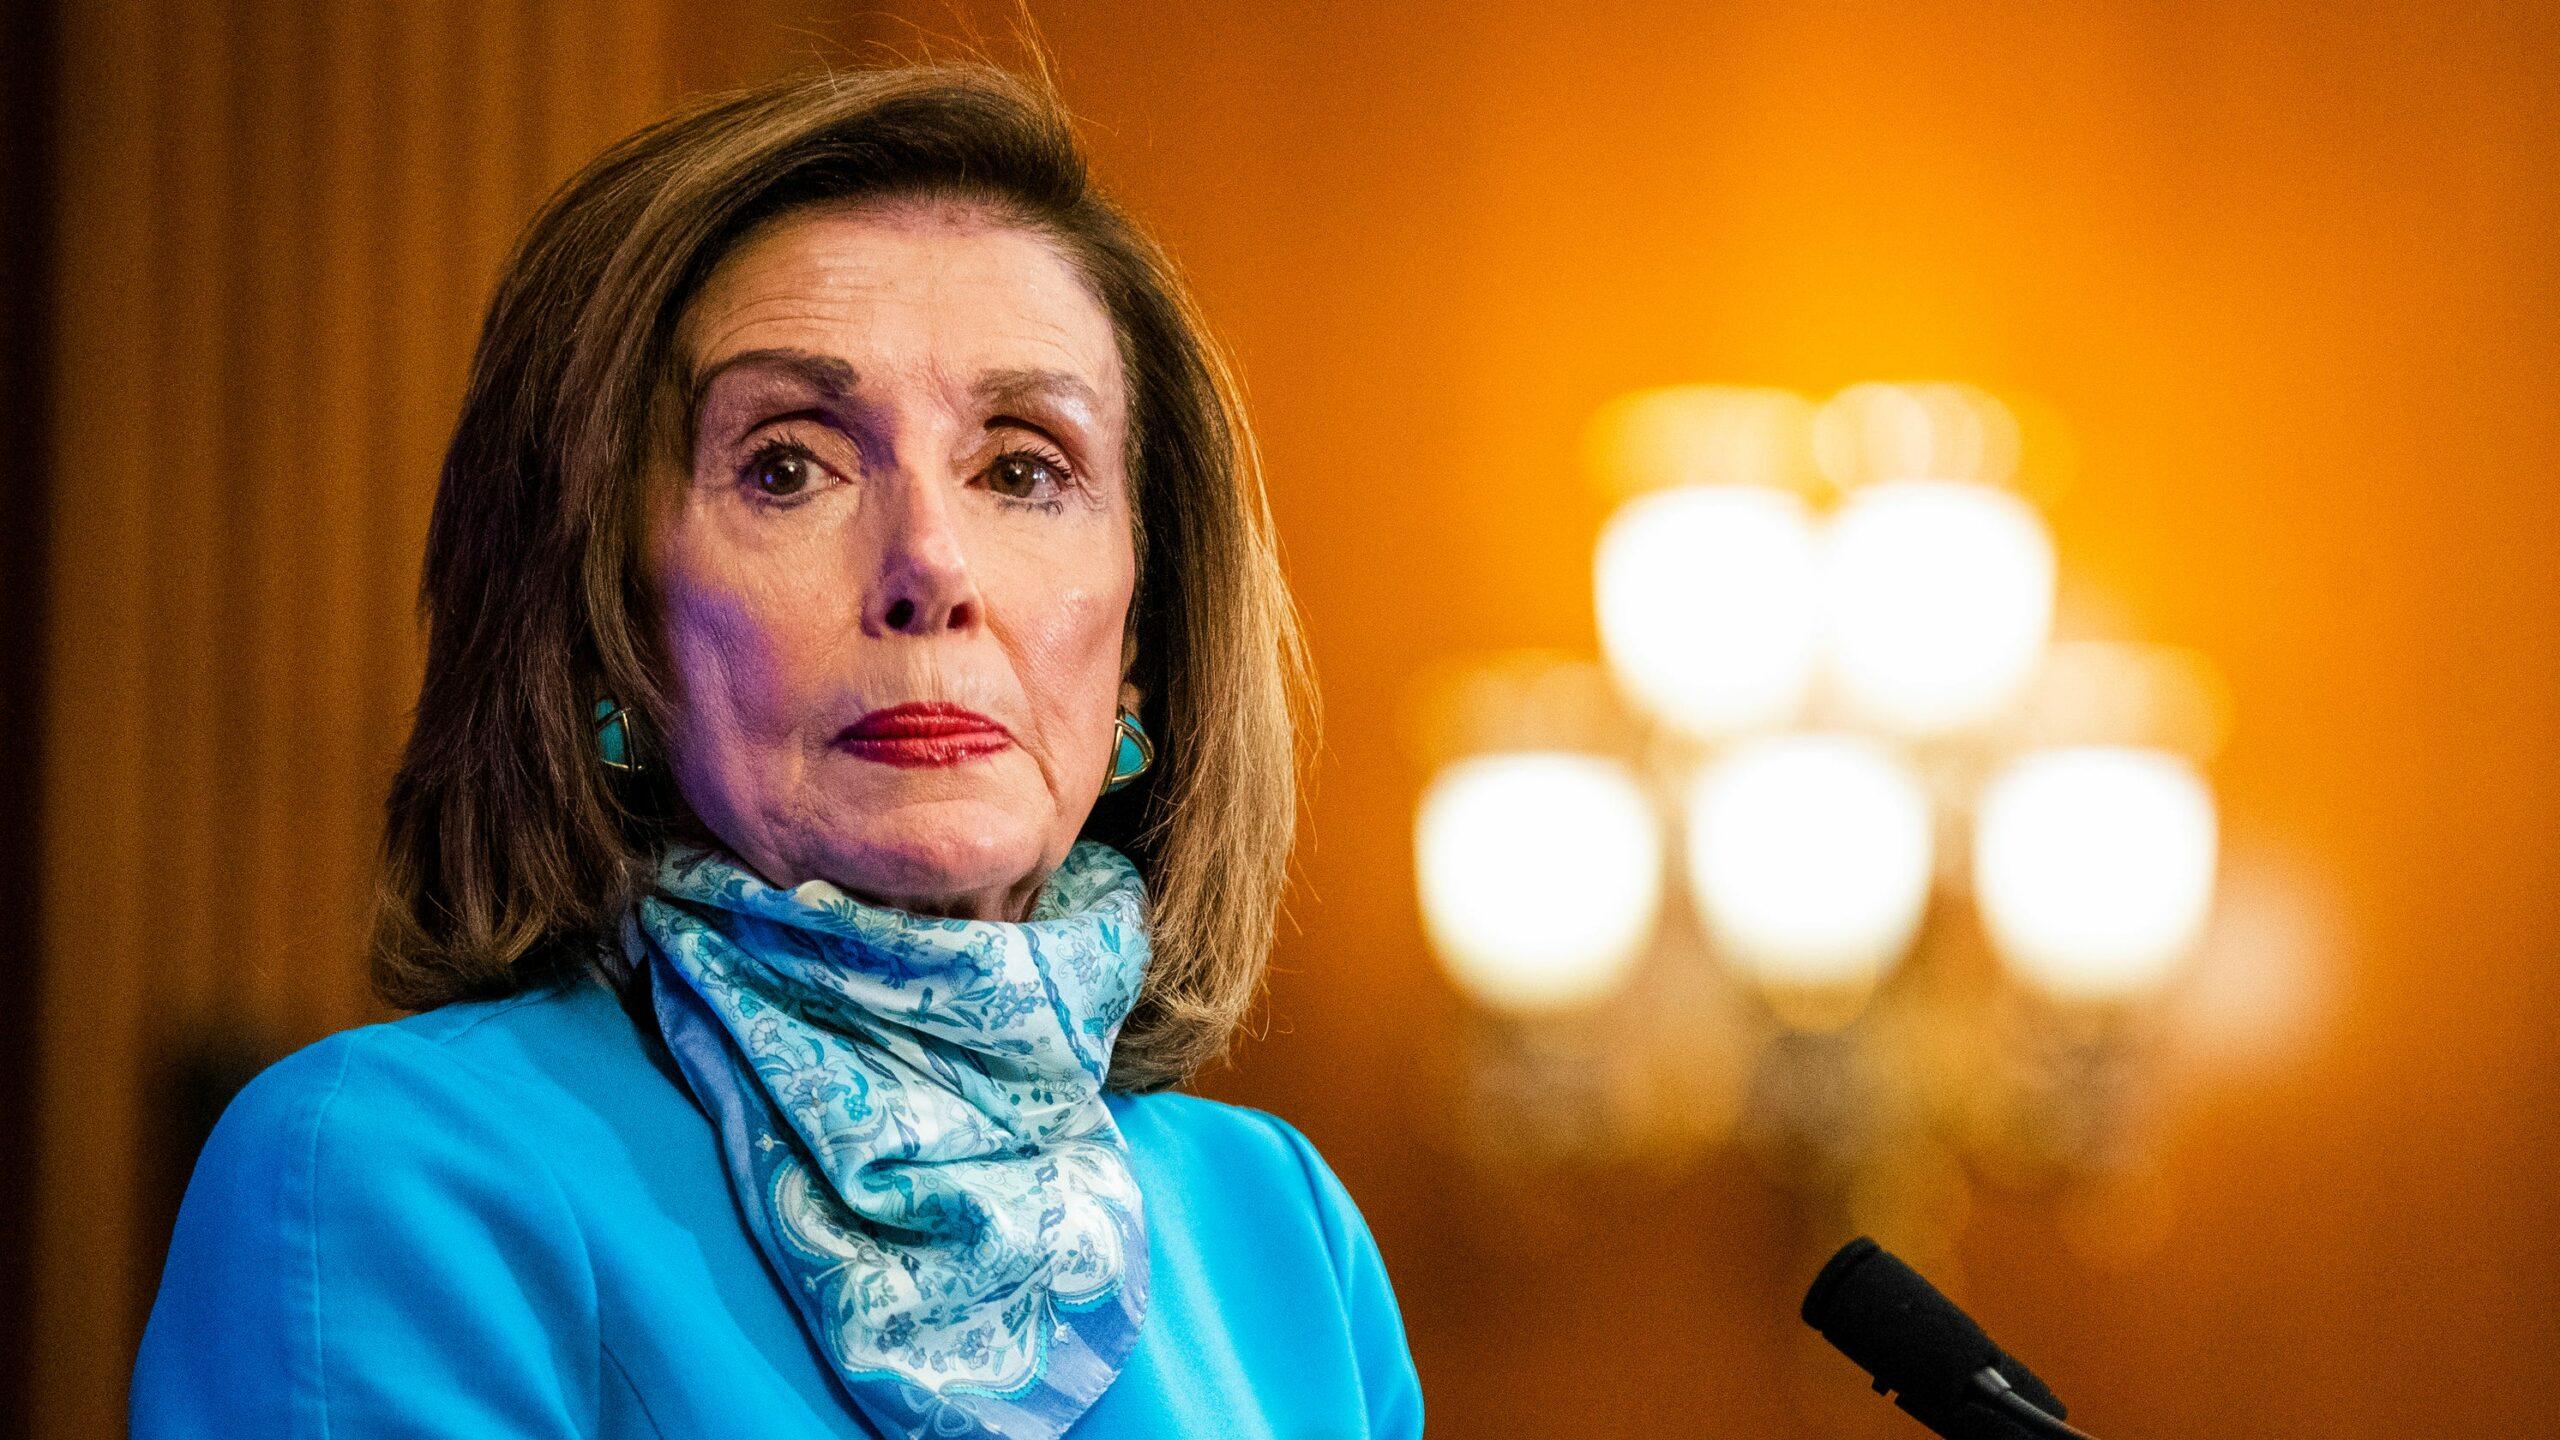 Democrats' $3 trillion coronavirus stimulus proposal includes more $1,200 checks, money for state and local governments